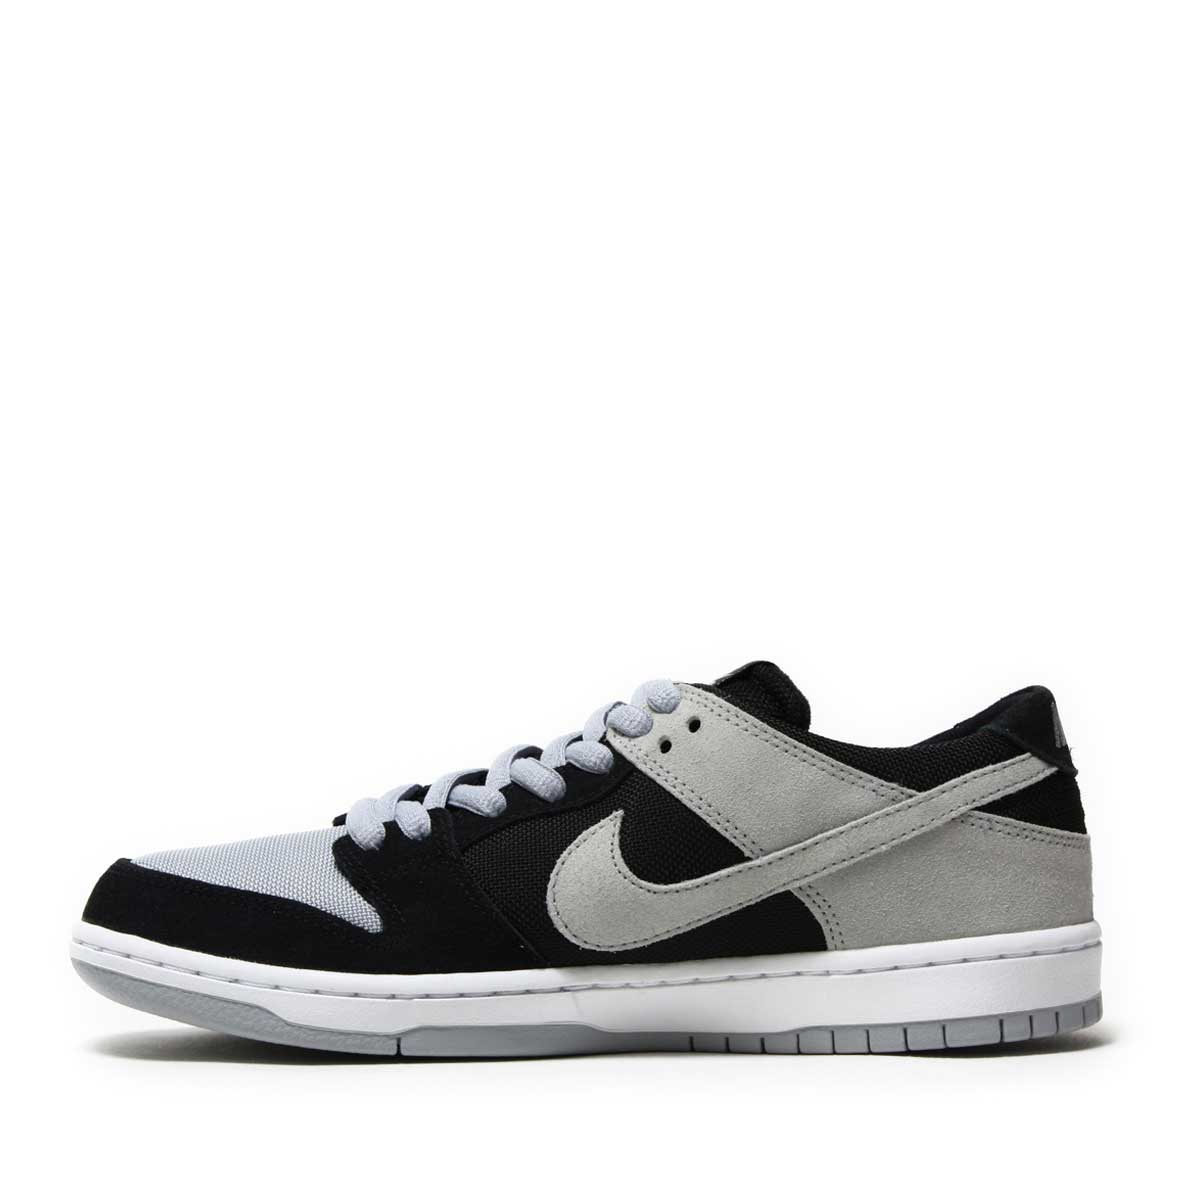 wholesale dealer c6c13 36299 NIKE SB ZOOM DUNK LOW PRO (Nike SB zoom dunk low pro) BLACK WOLF  GREY-WHITE-WHITE 17HO-I